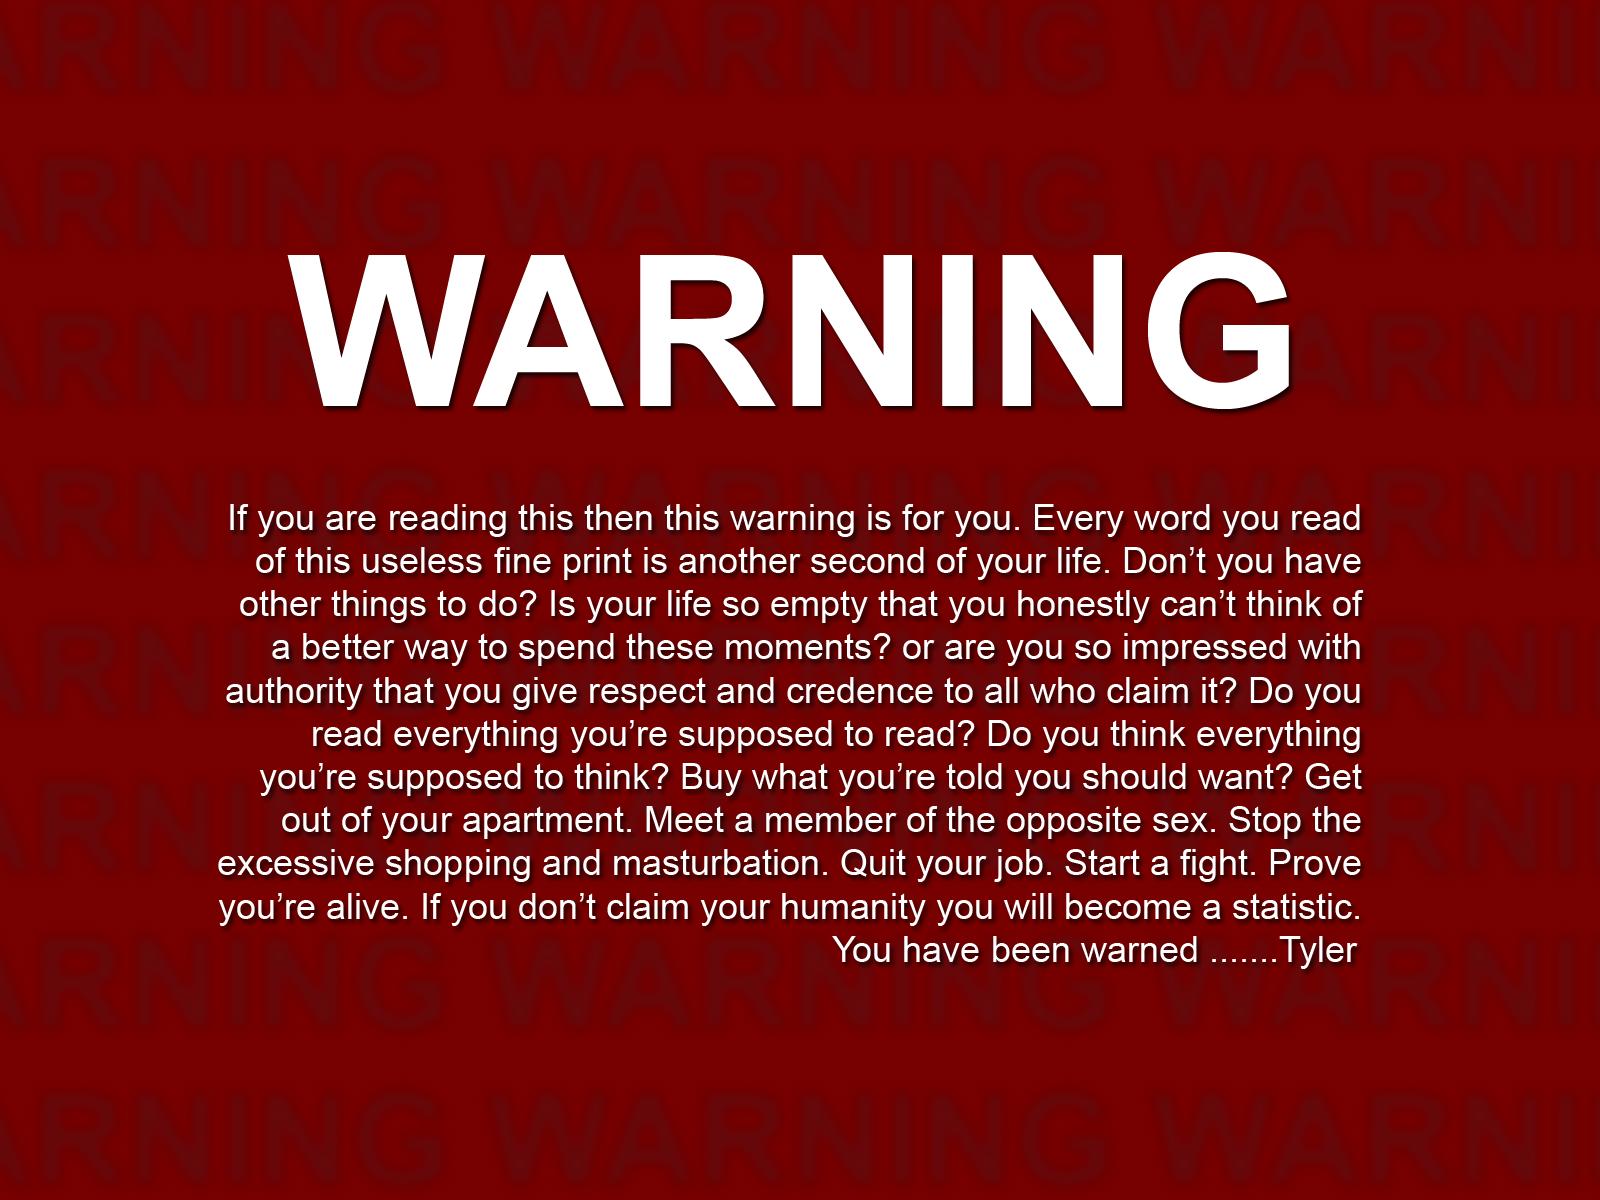 Warning v20 by freoment 1600x1200